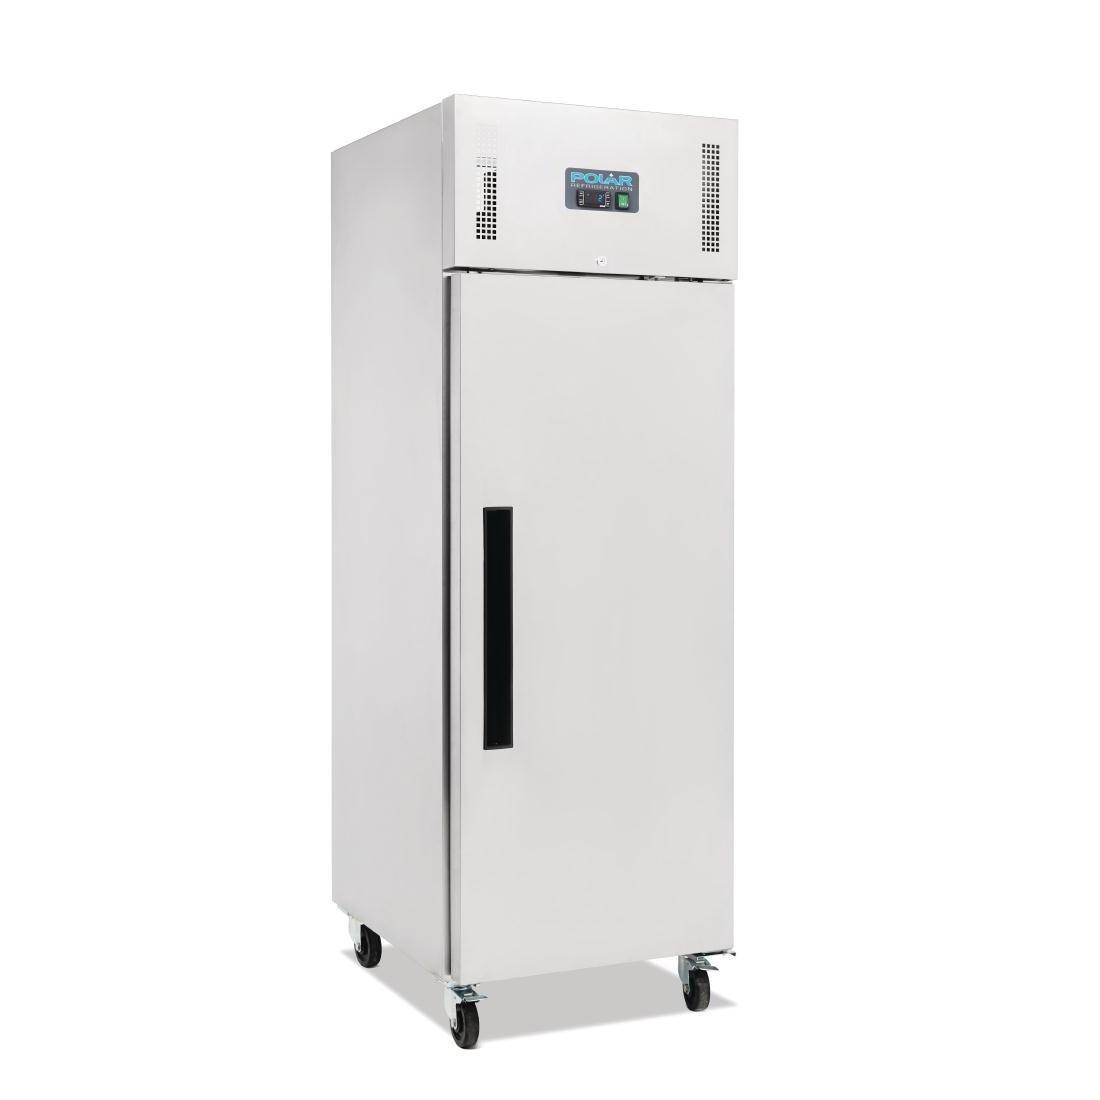 congelador industrial.jpg